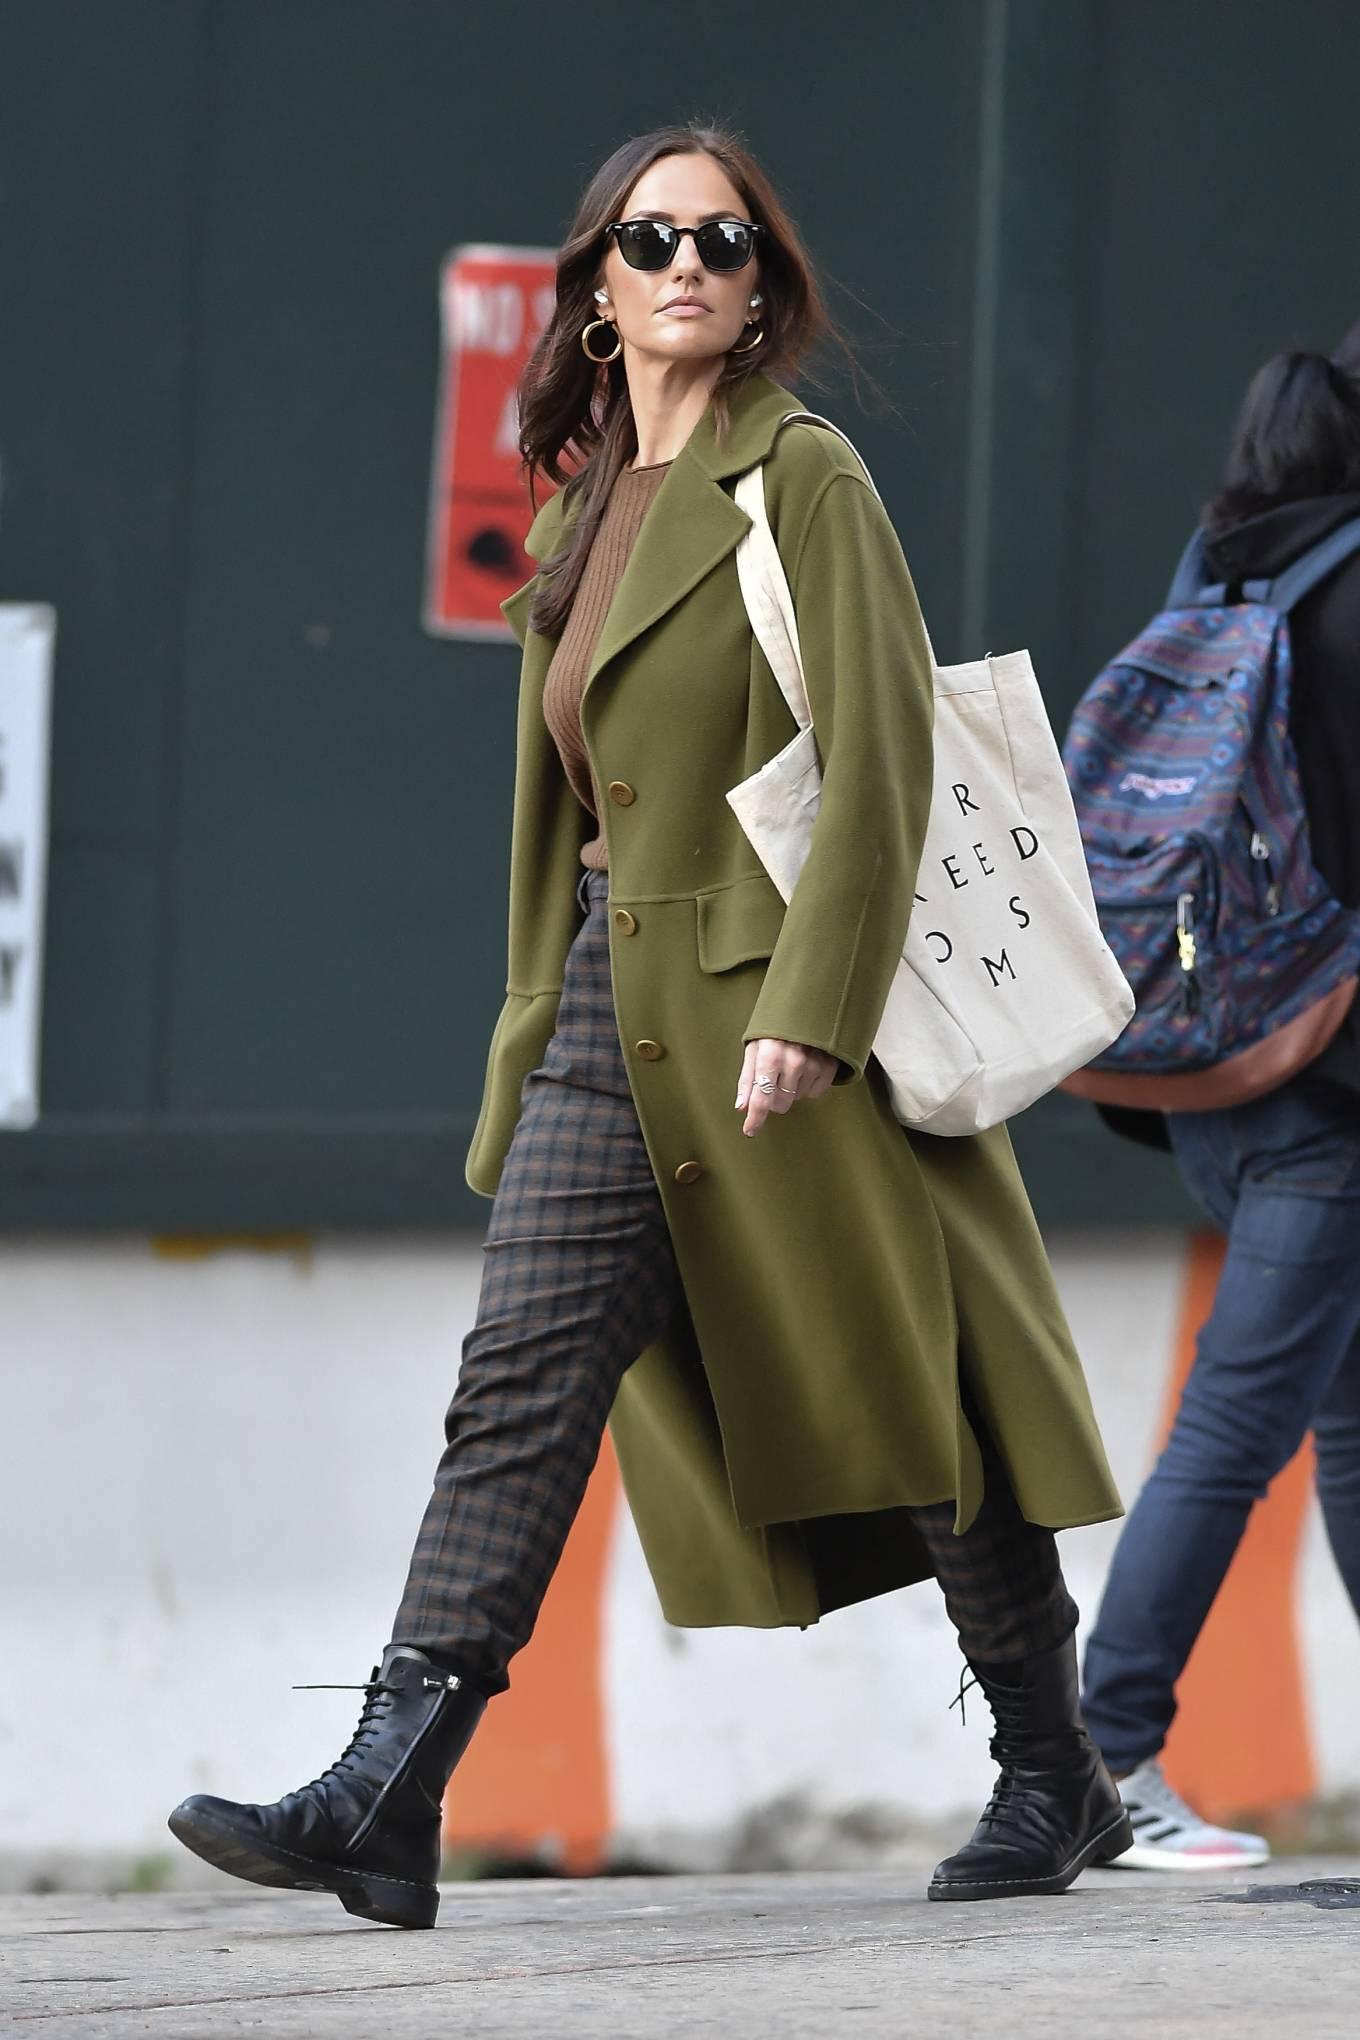 Minka Kelly 2021 : Minka Kelly – In olive green runs errands in New York-32